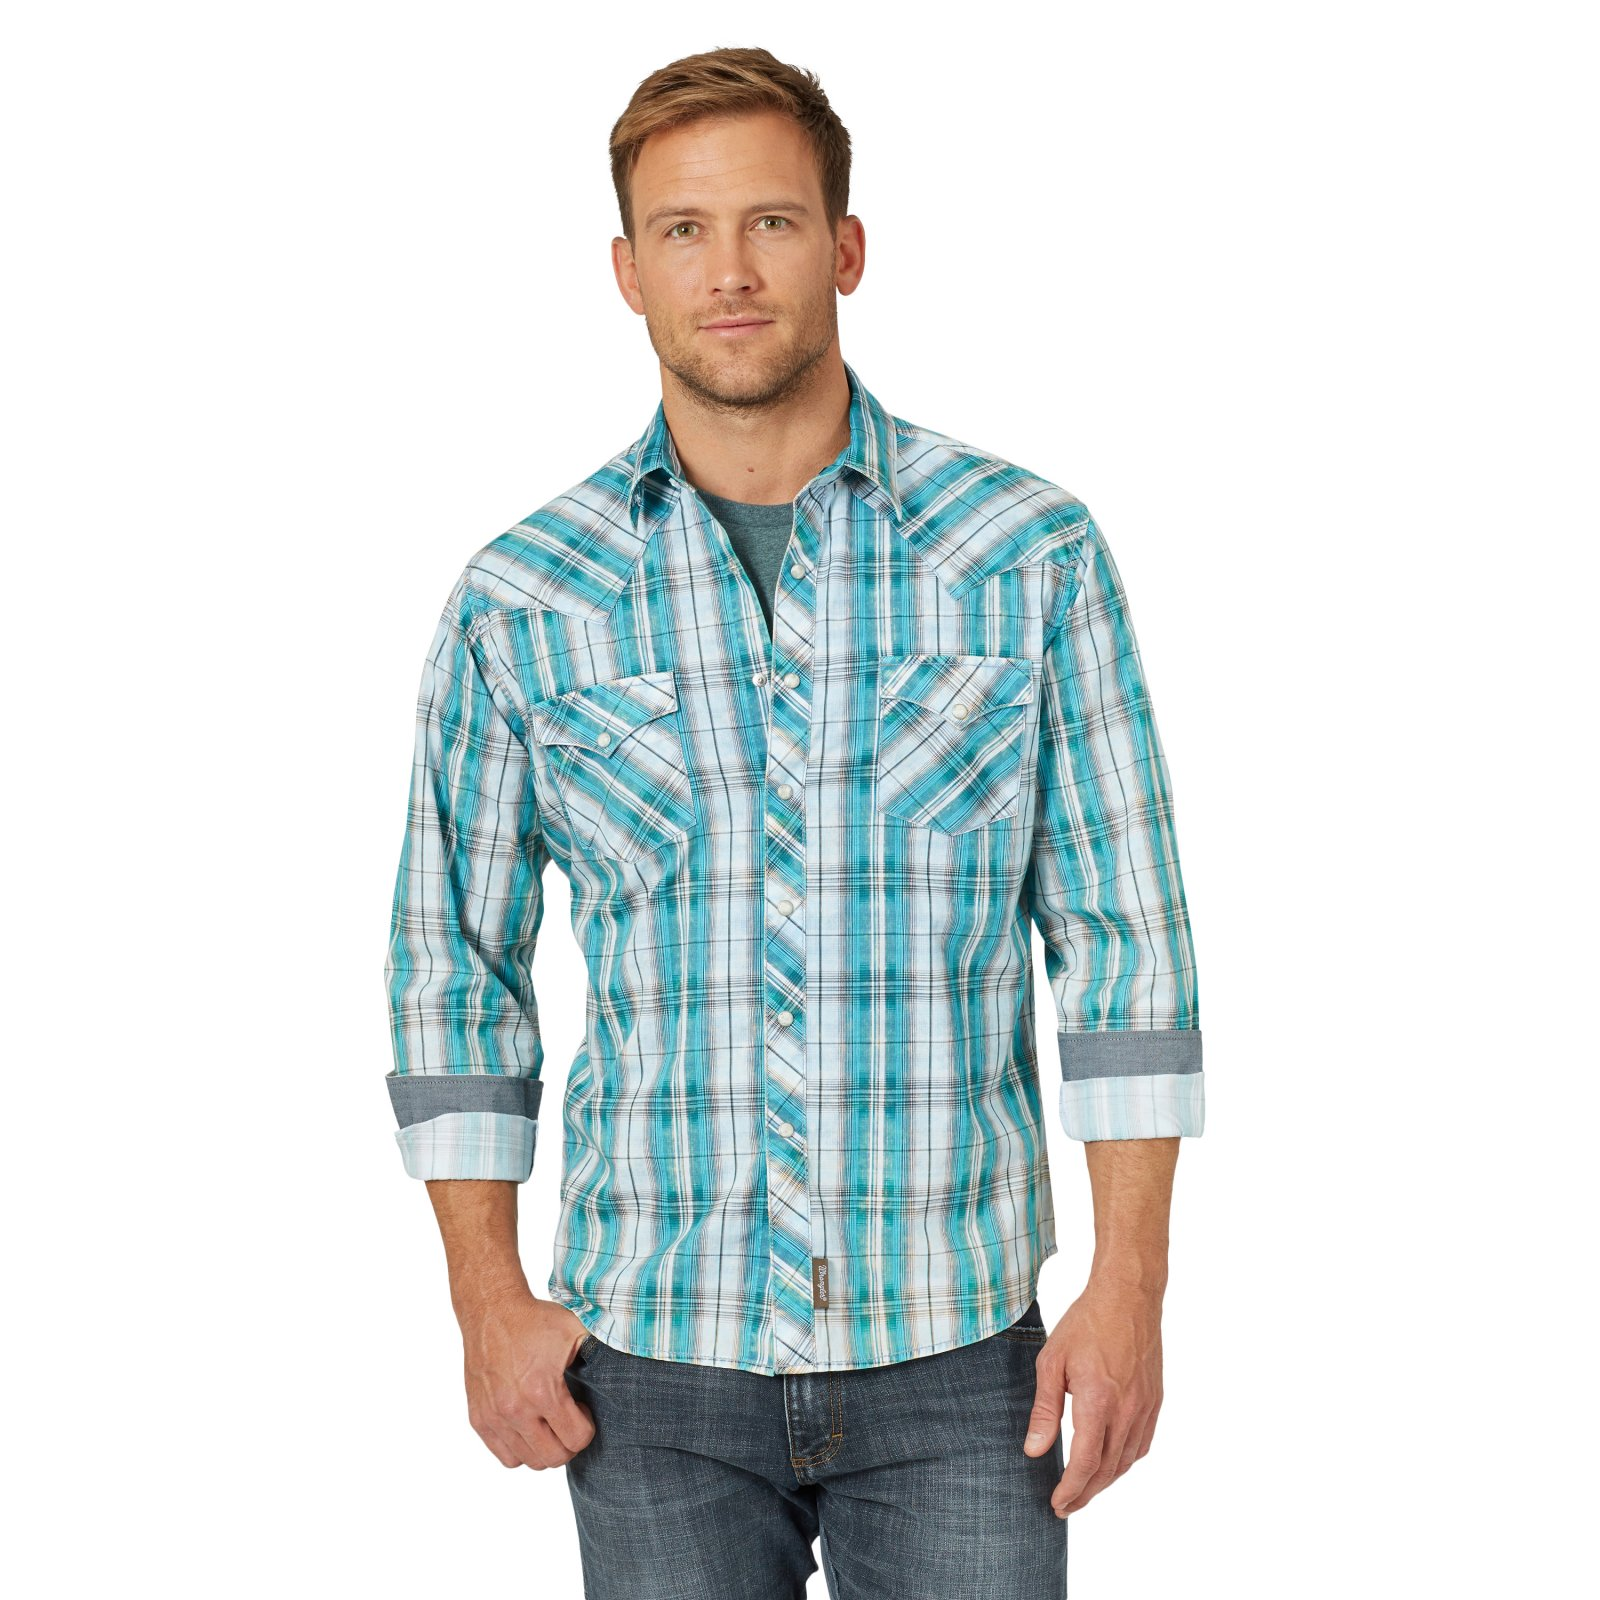 Wrangler Men's Retro LS Shirt Teal 0620